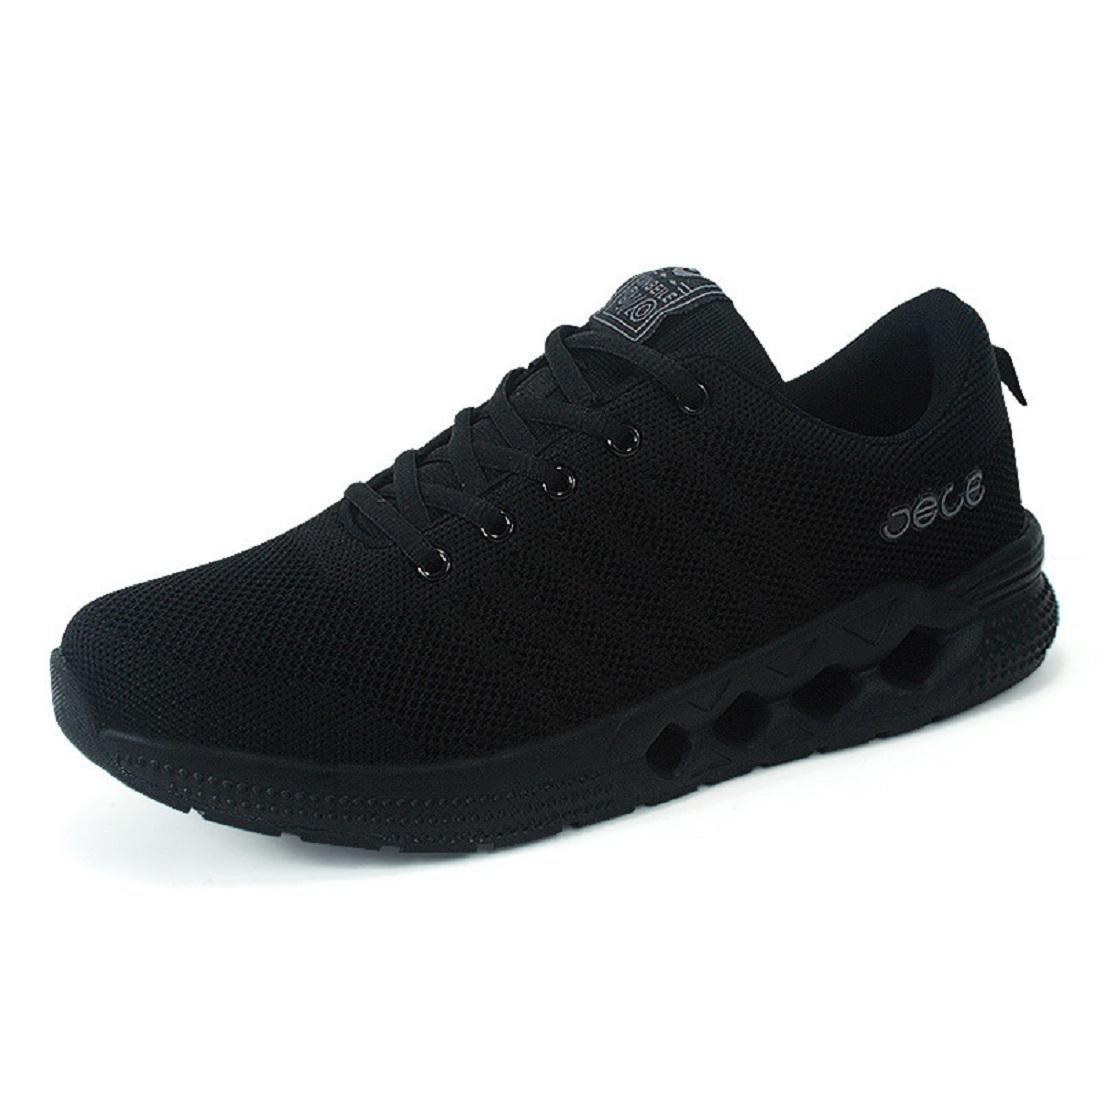 Herren Mode Lässige Schuhe Sportschuhe Trainer Winter Laufschuhe Flache Schuhe Schuhe erhöhen Trainer Werkzeugschuhe EUR GRÖSSE 39-44